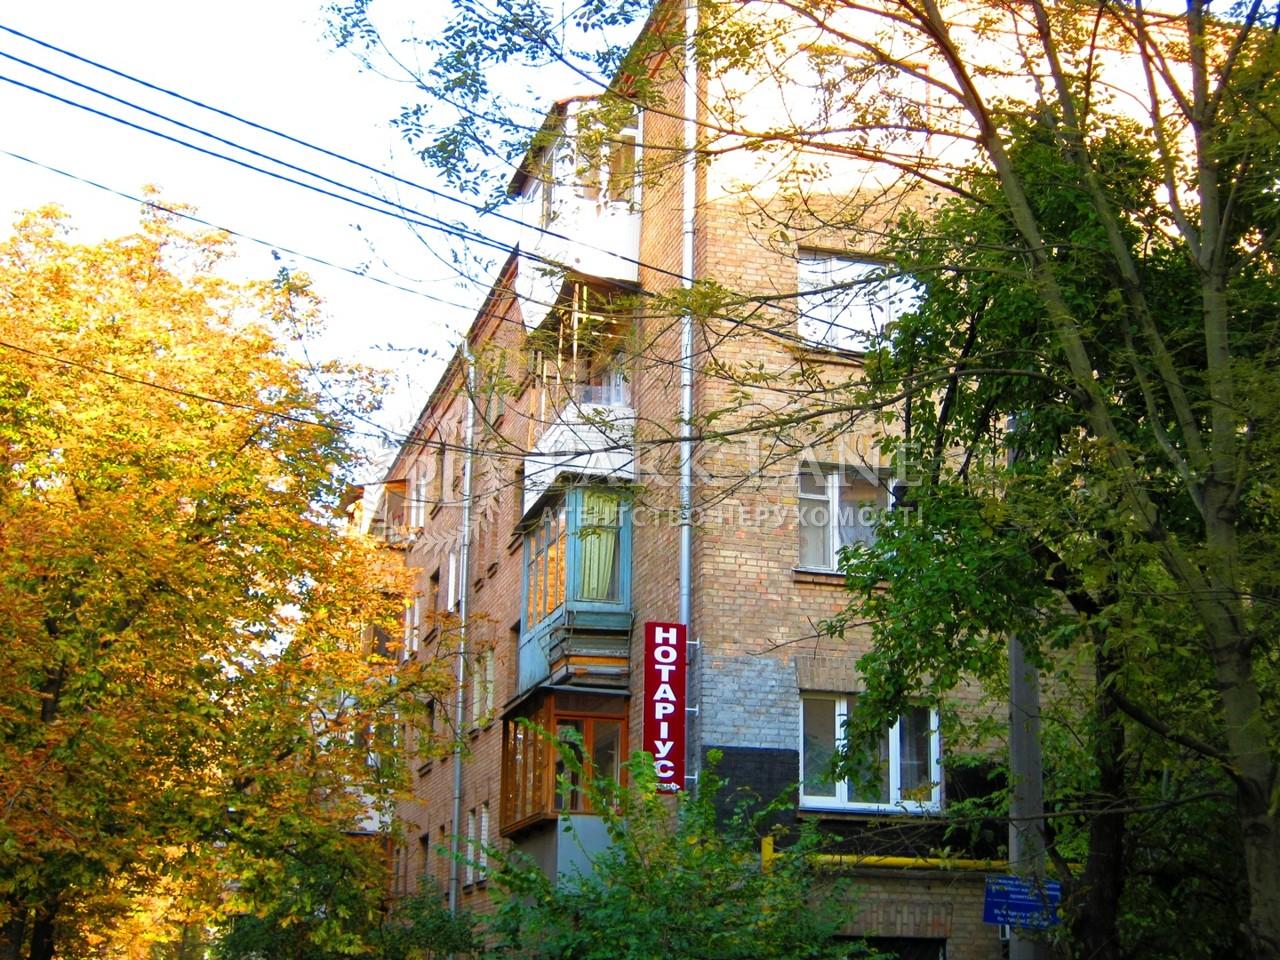 Квартира ул. Цитадельная, 9, Киев, L-24492 - Фото 1